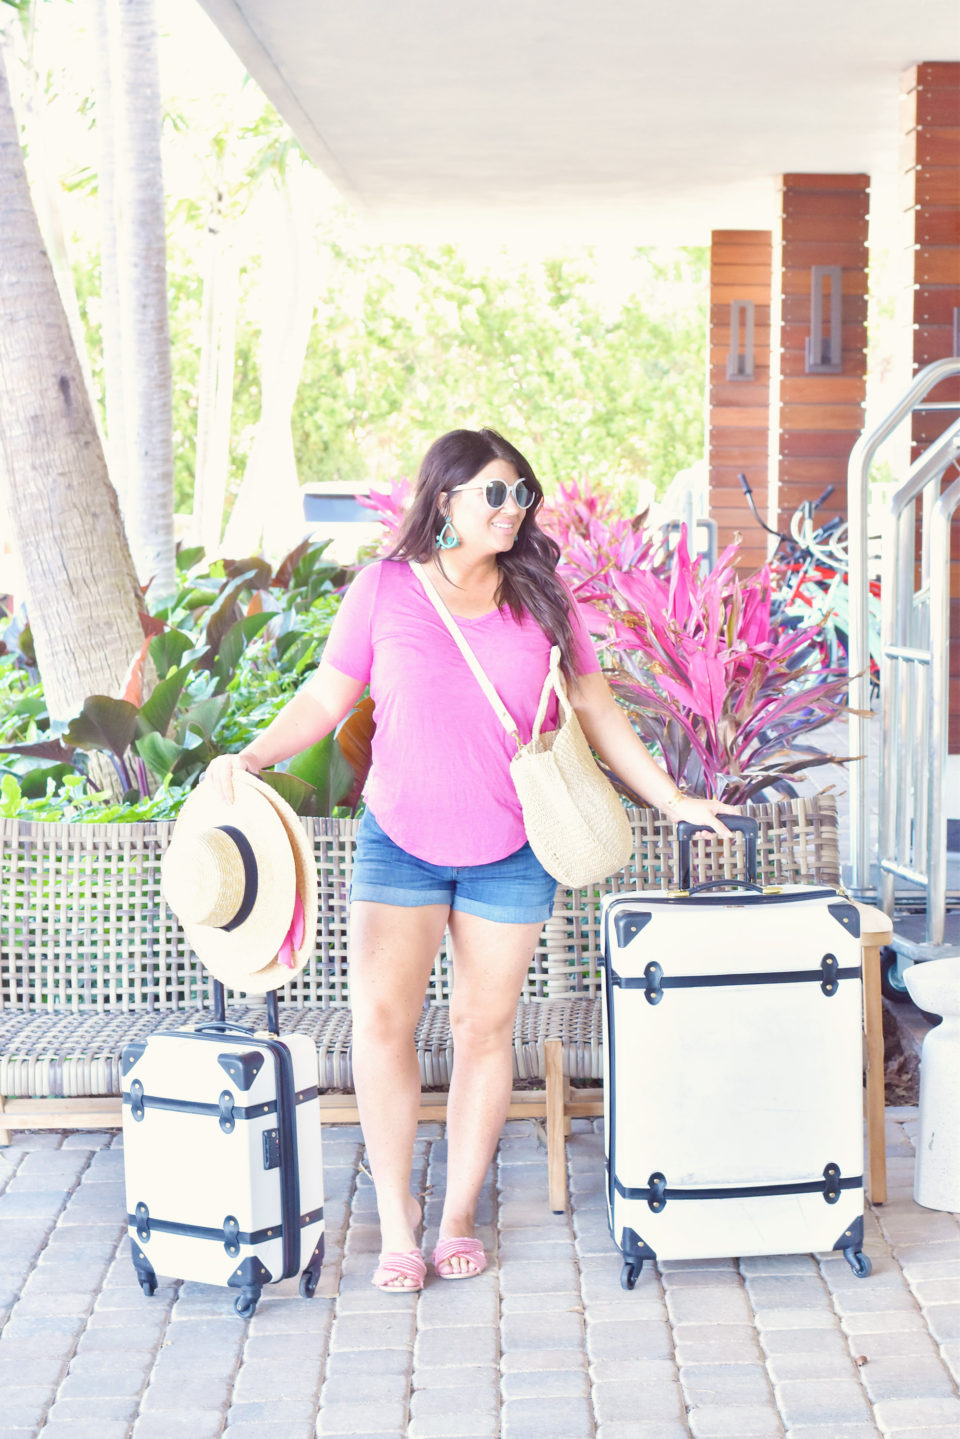 Amara Cay Islamorada White Luggage